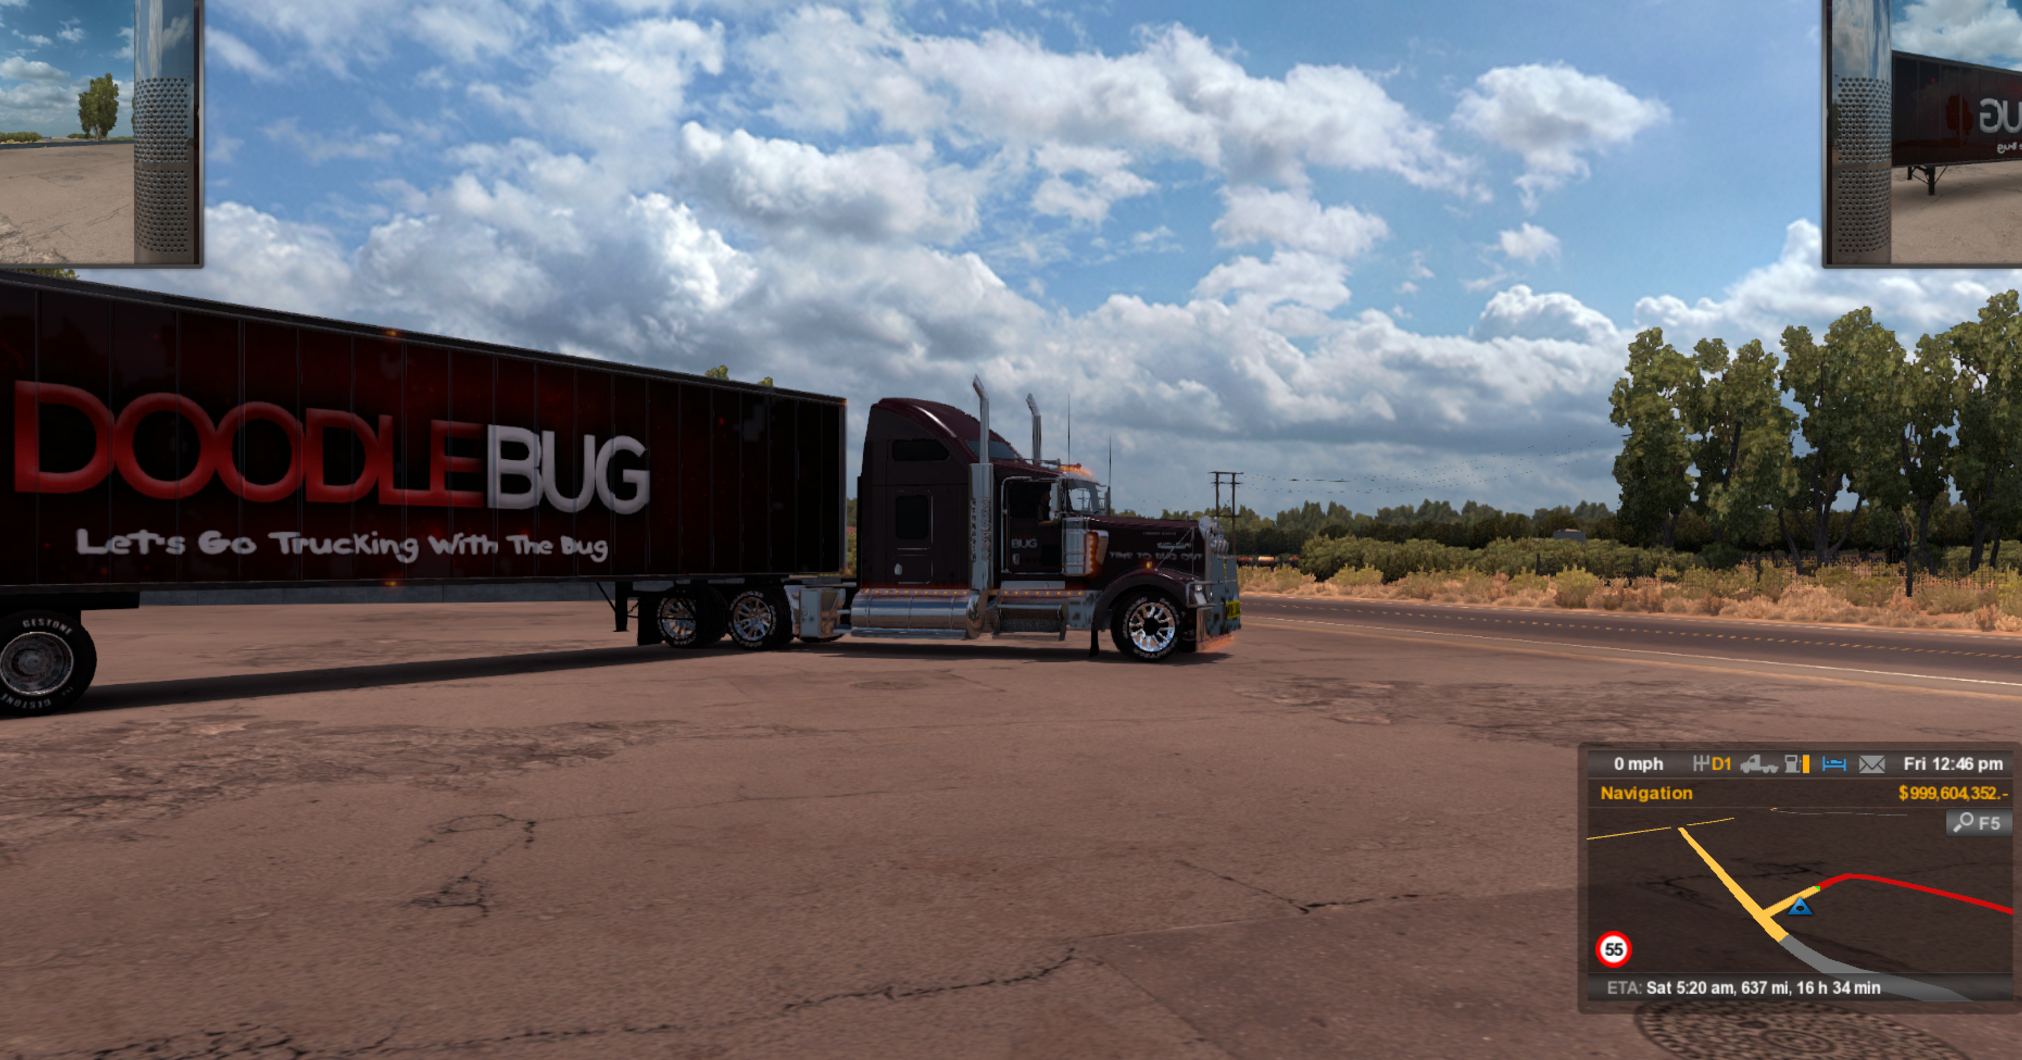 Youtube Gamer Doodle bug Trailer - ATS Mod | American Truck